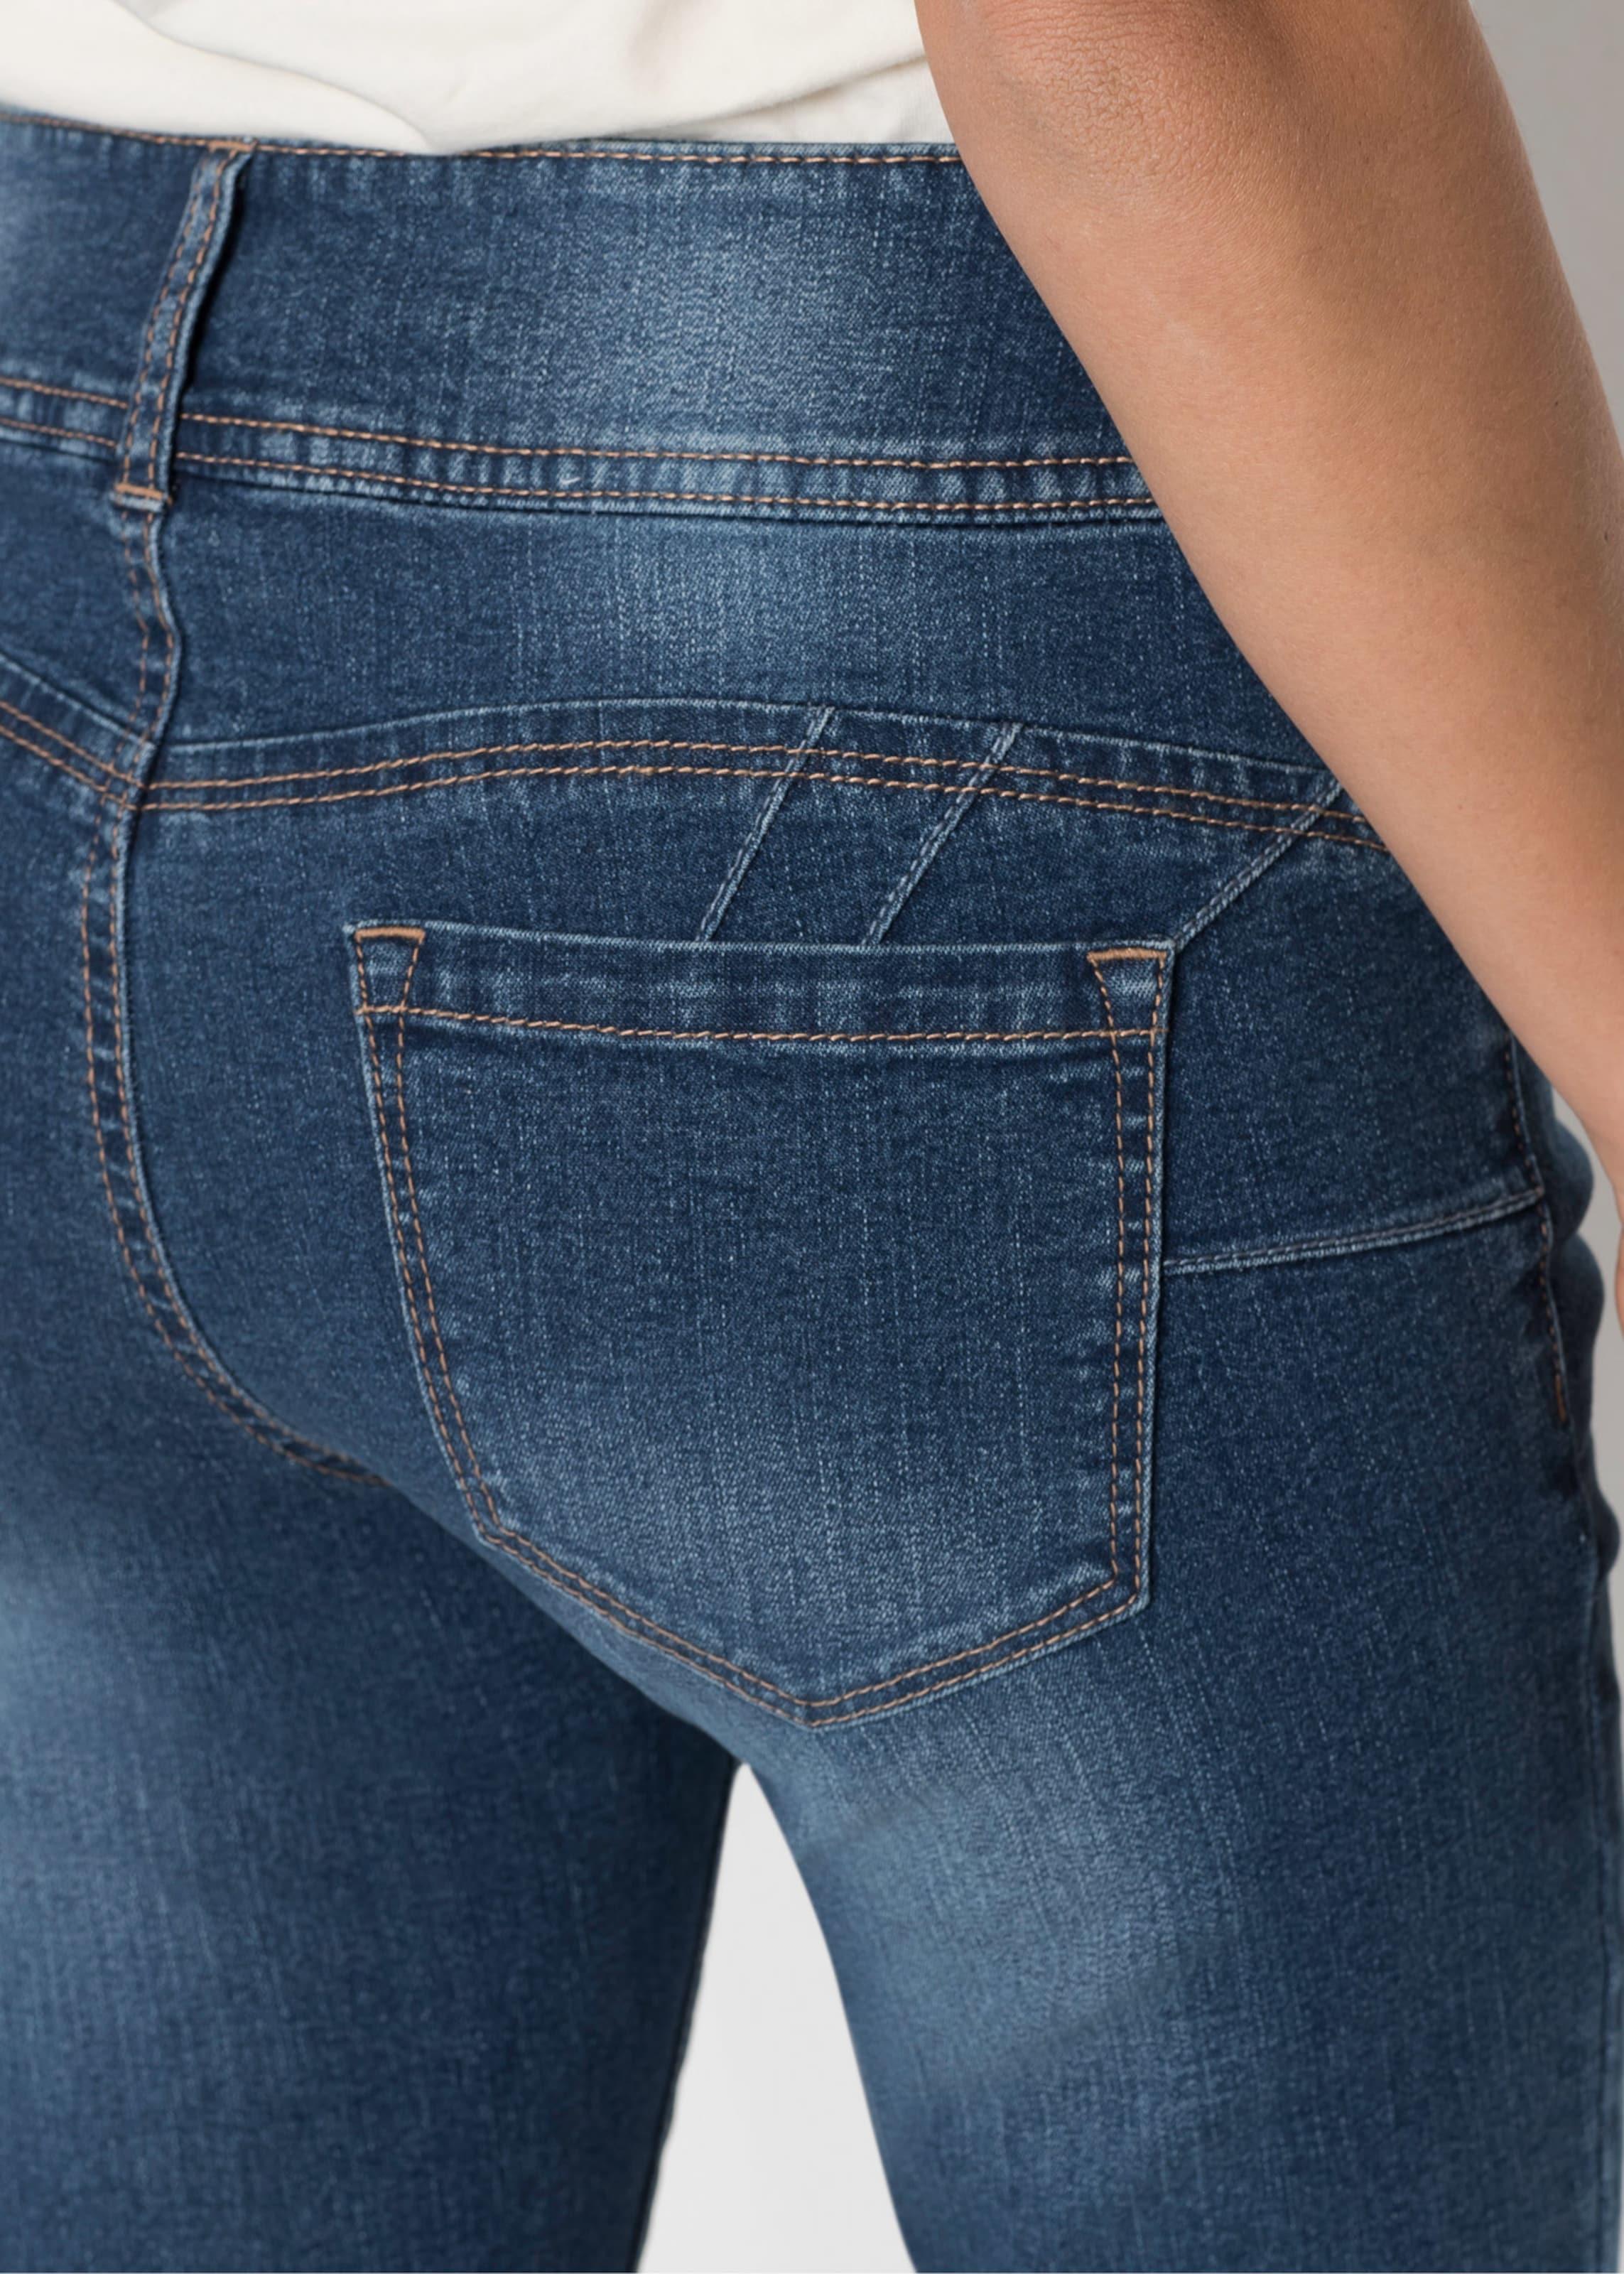 up Jeans Mit Effekt In Blau Push Bonprix 7yfgbY6